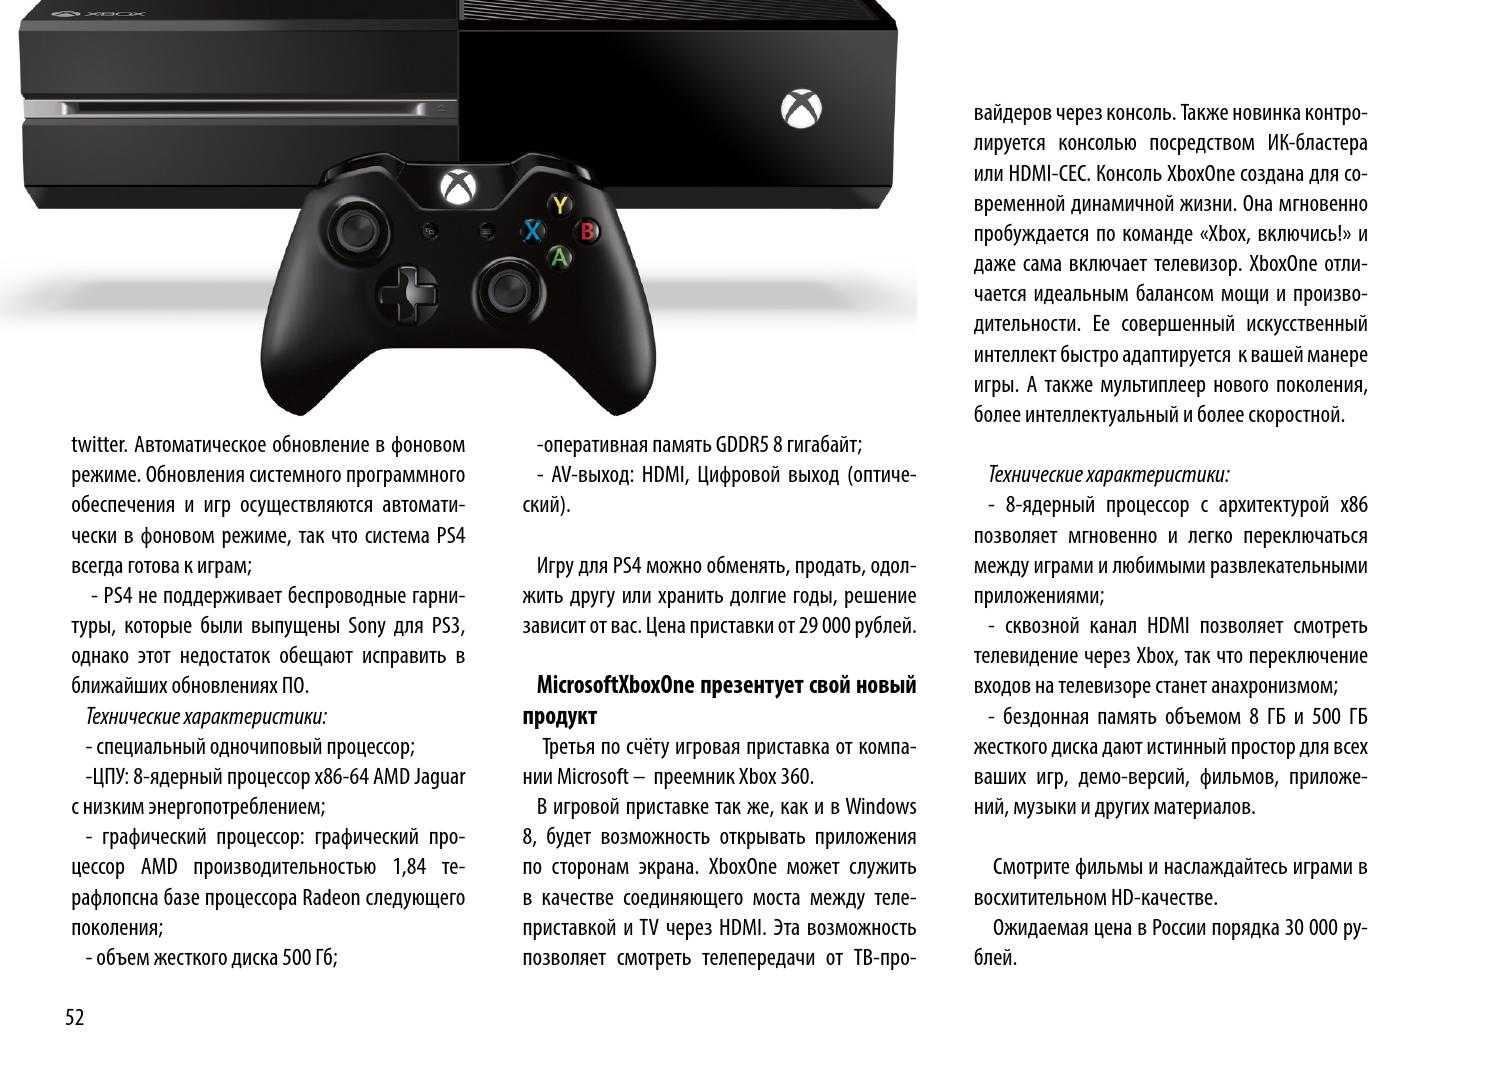 Konami unveils a mini turbografx-16 console - websetnet